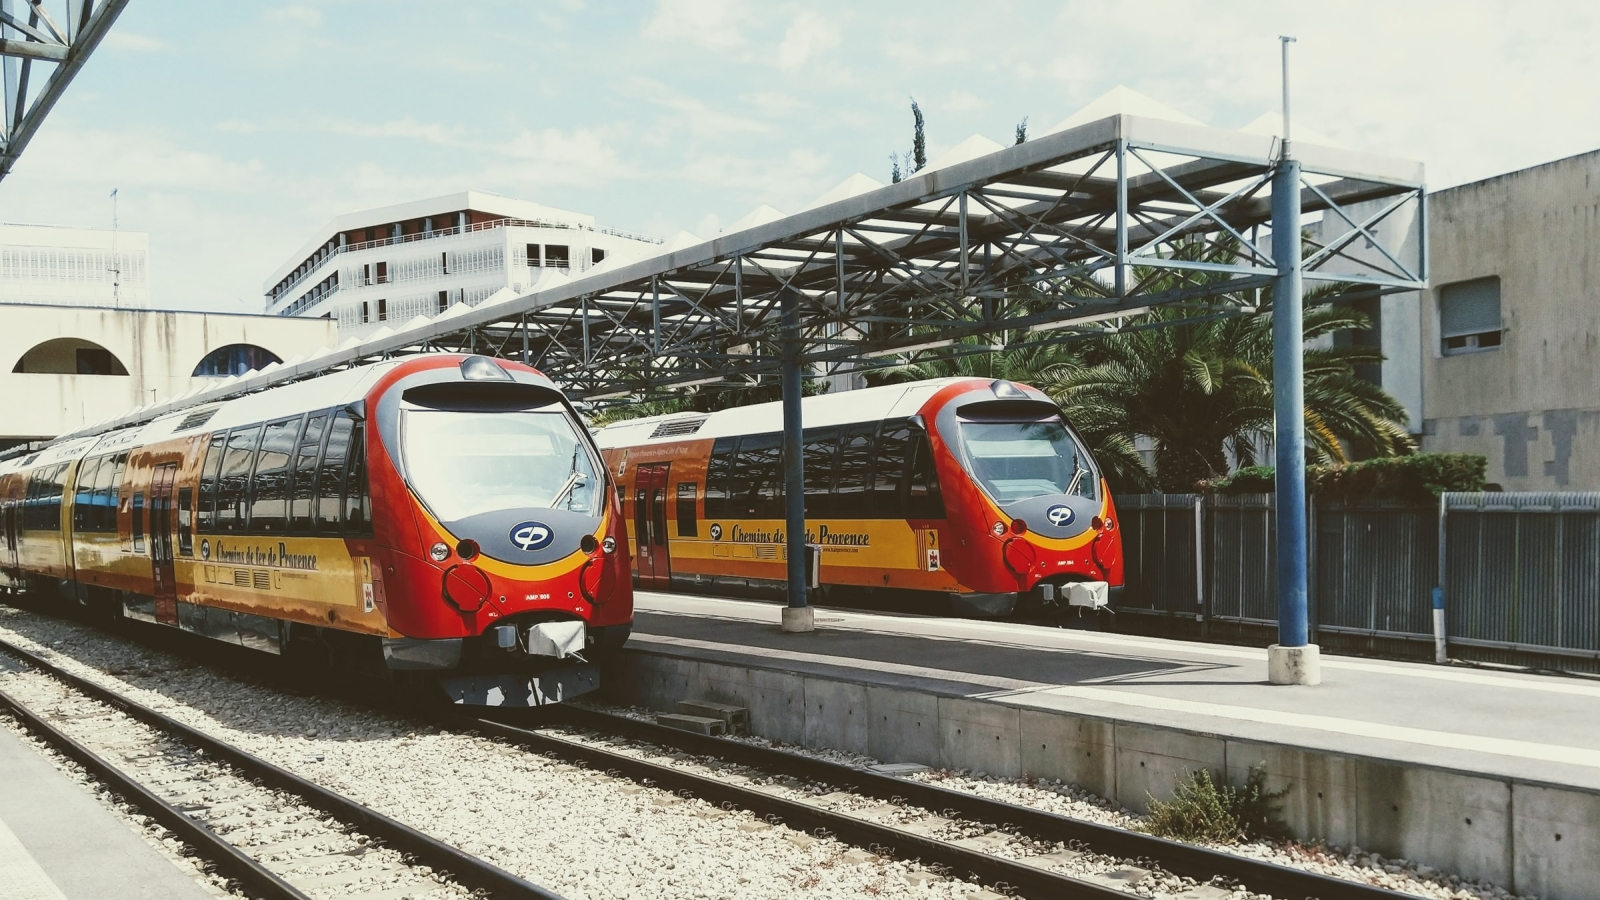 Togsett på Gare de Nice, Nice, Frankrike. Foto: Christopher, Unsplash.